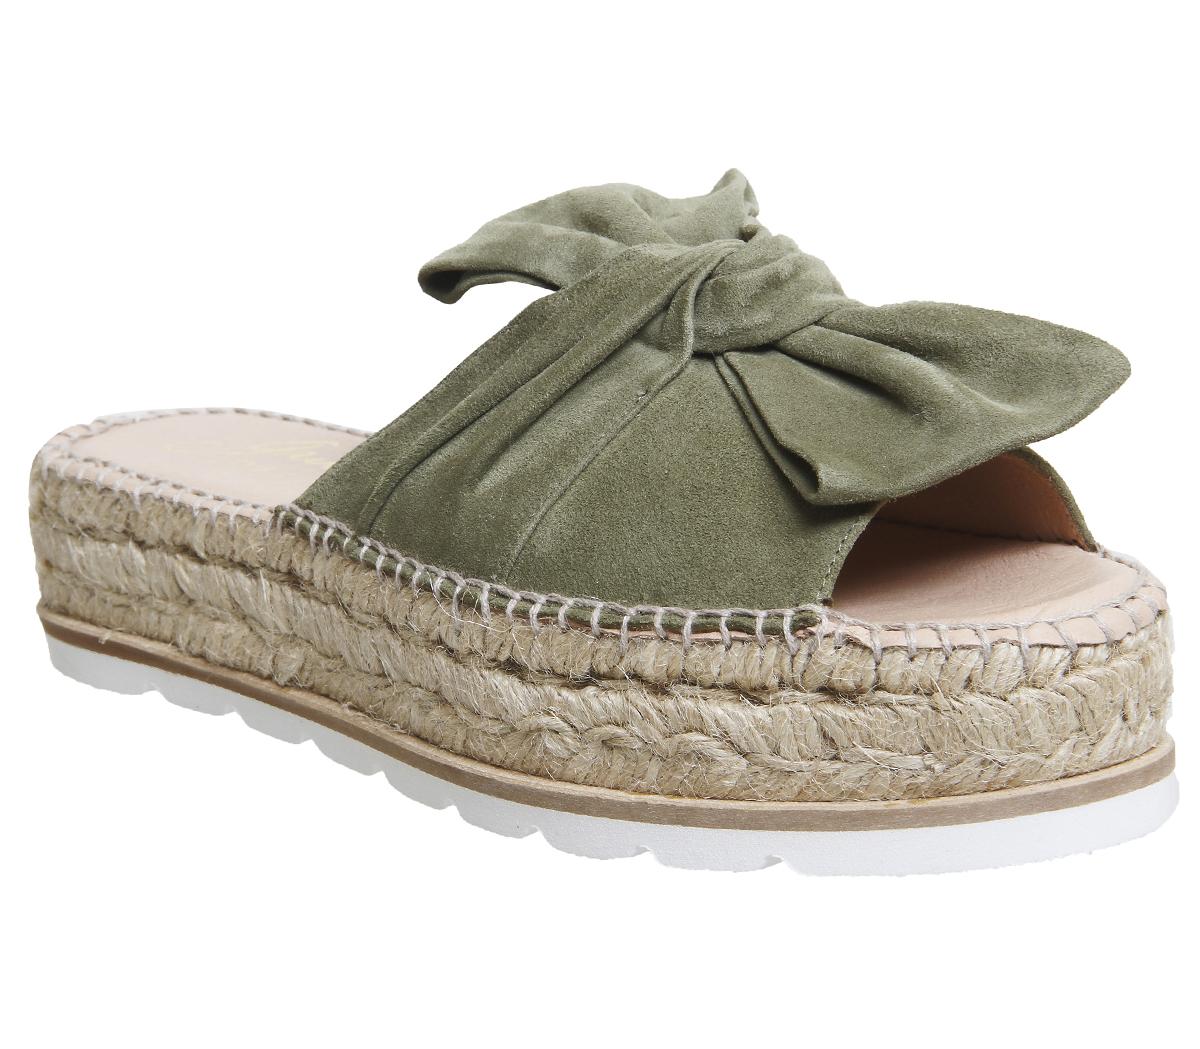 8a16c05ecedc Sentinel Womens Gaimo For Office Samanta Bow Flatform Sandals Khaki Suede  Heels